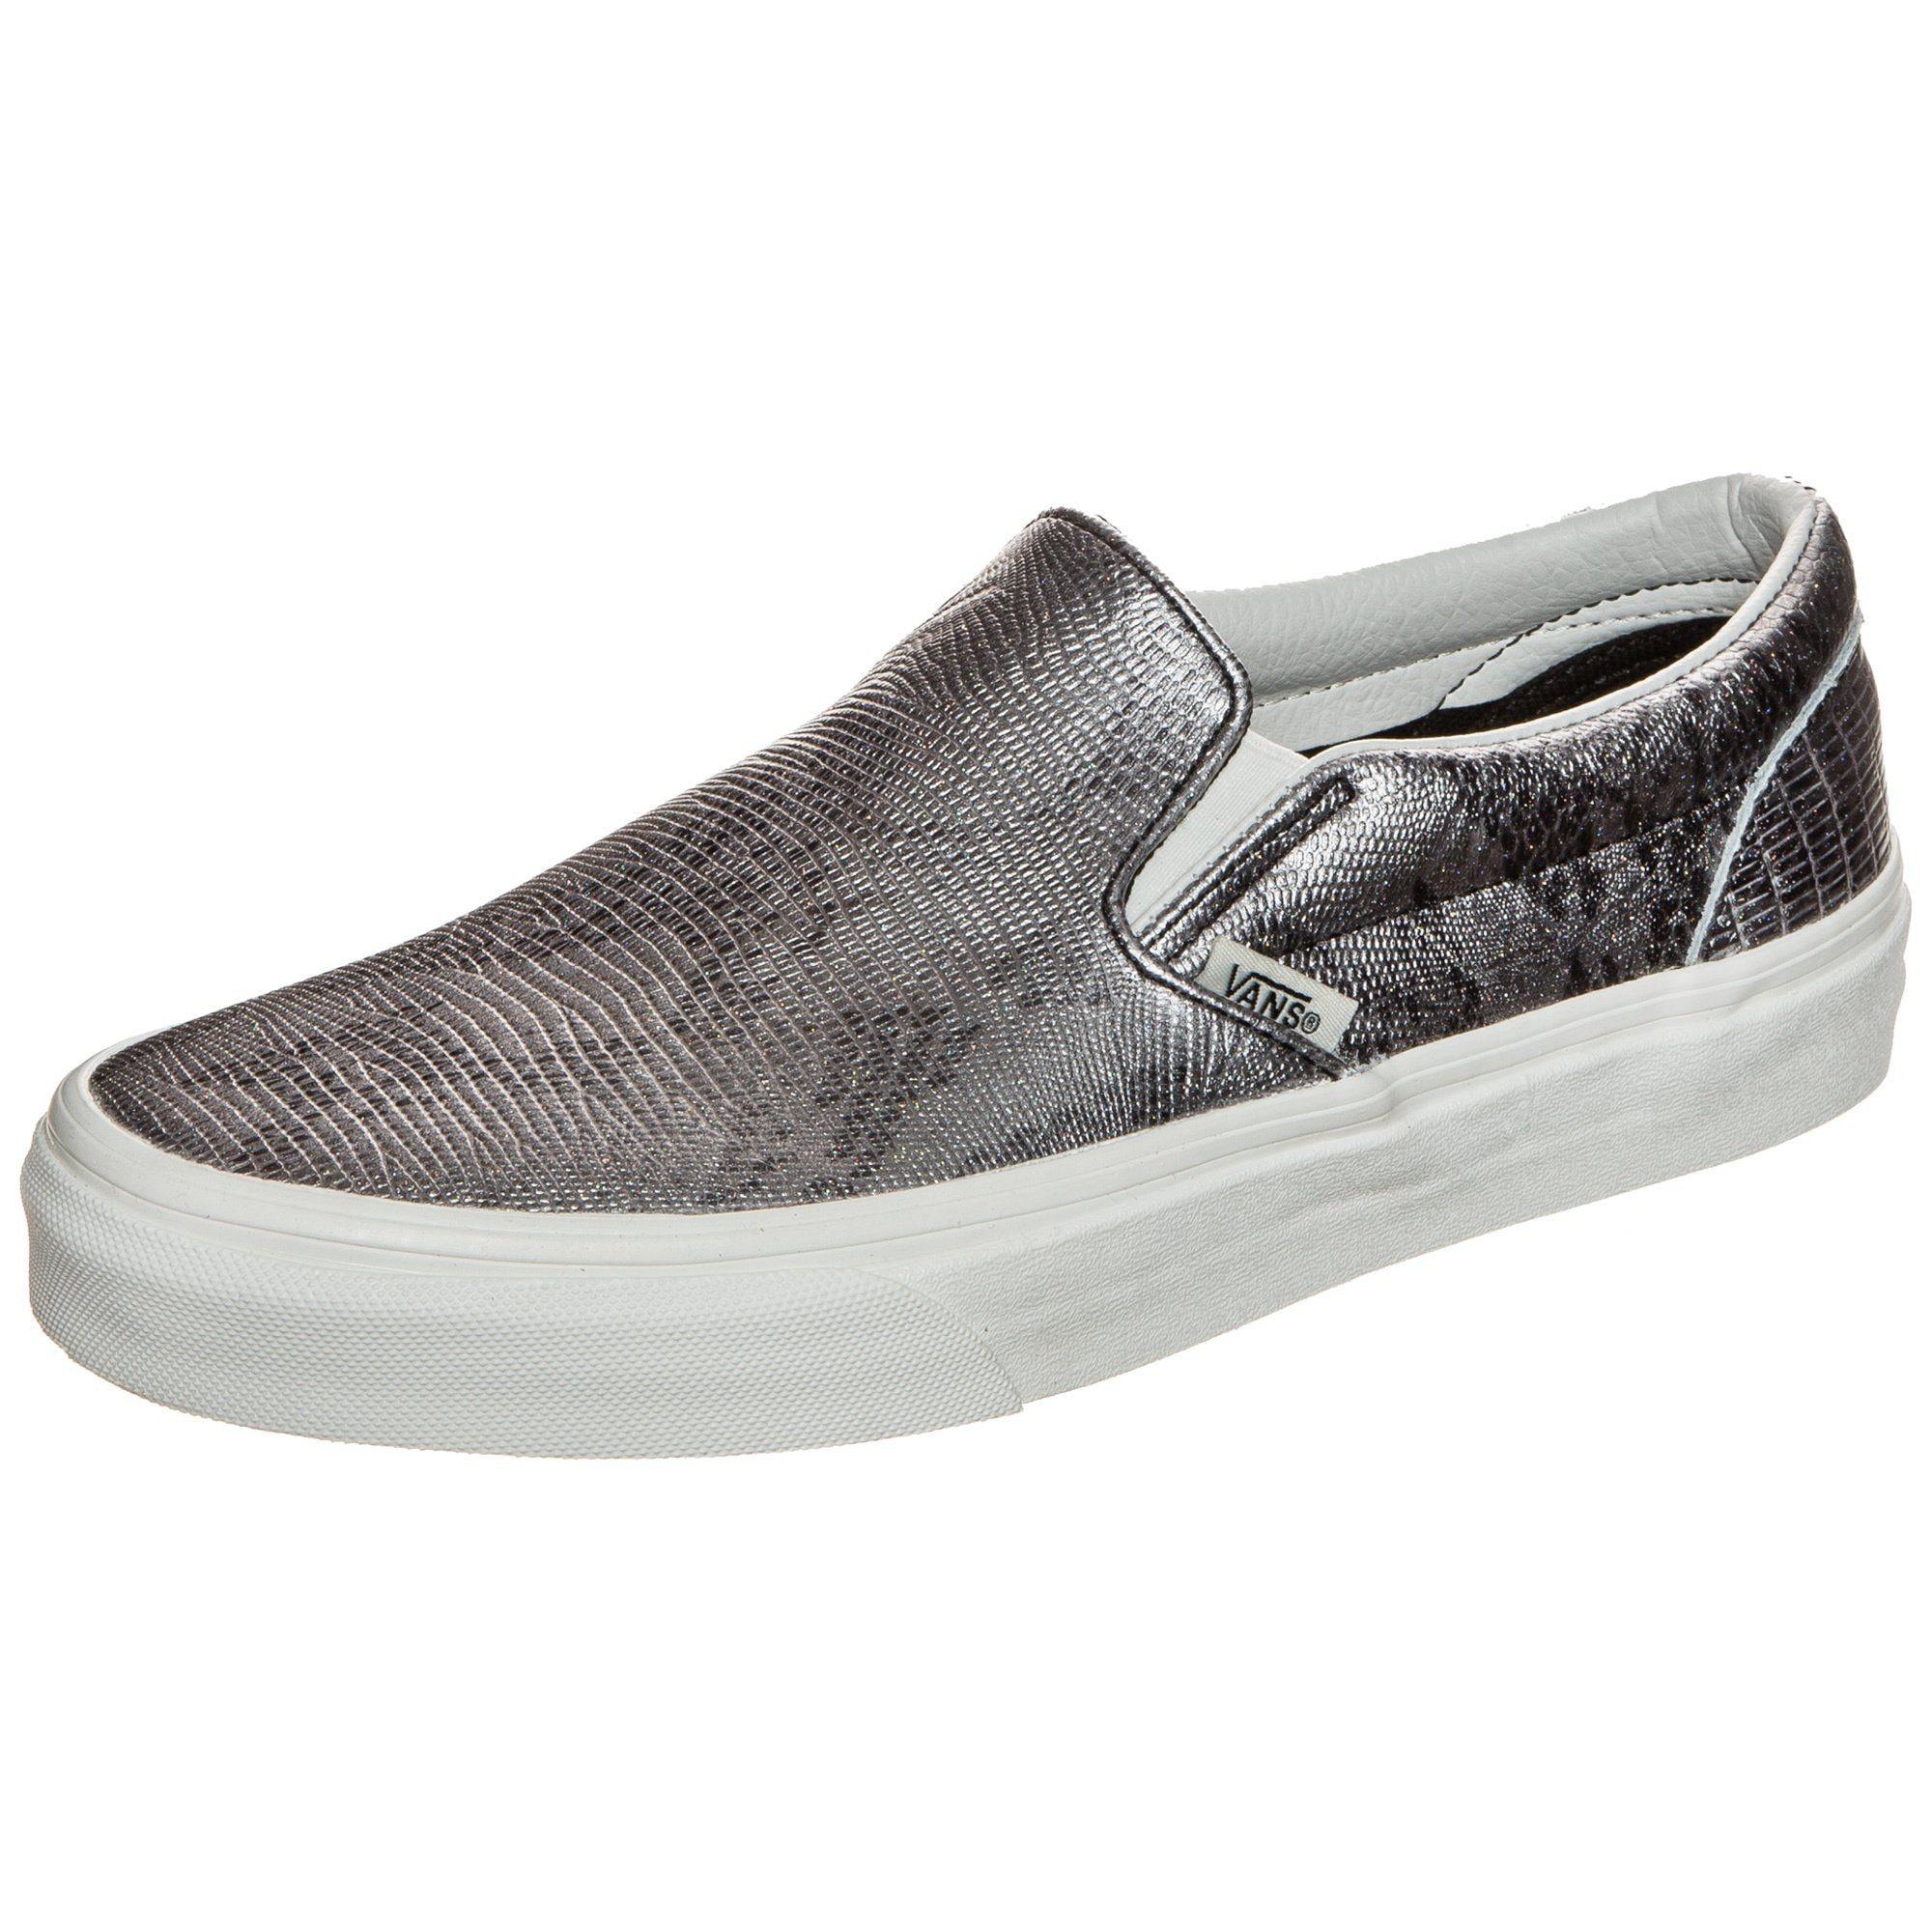 Vans classic slip on mule Damen US 8.5 Silber Pantoletten